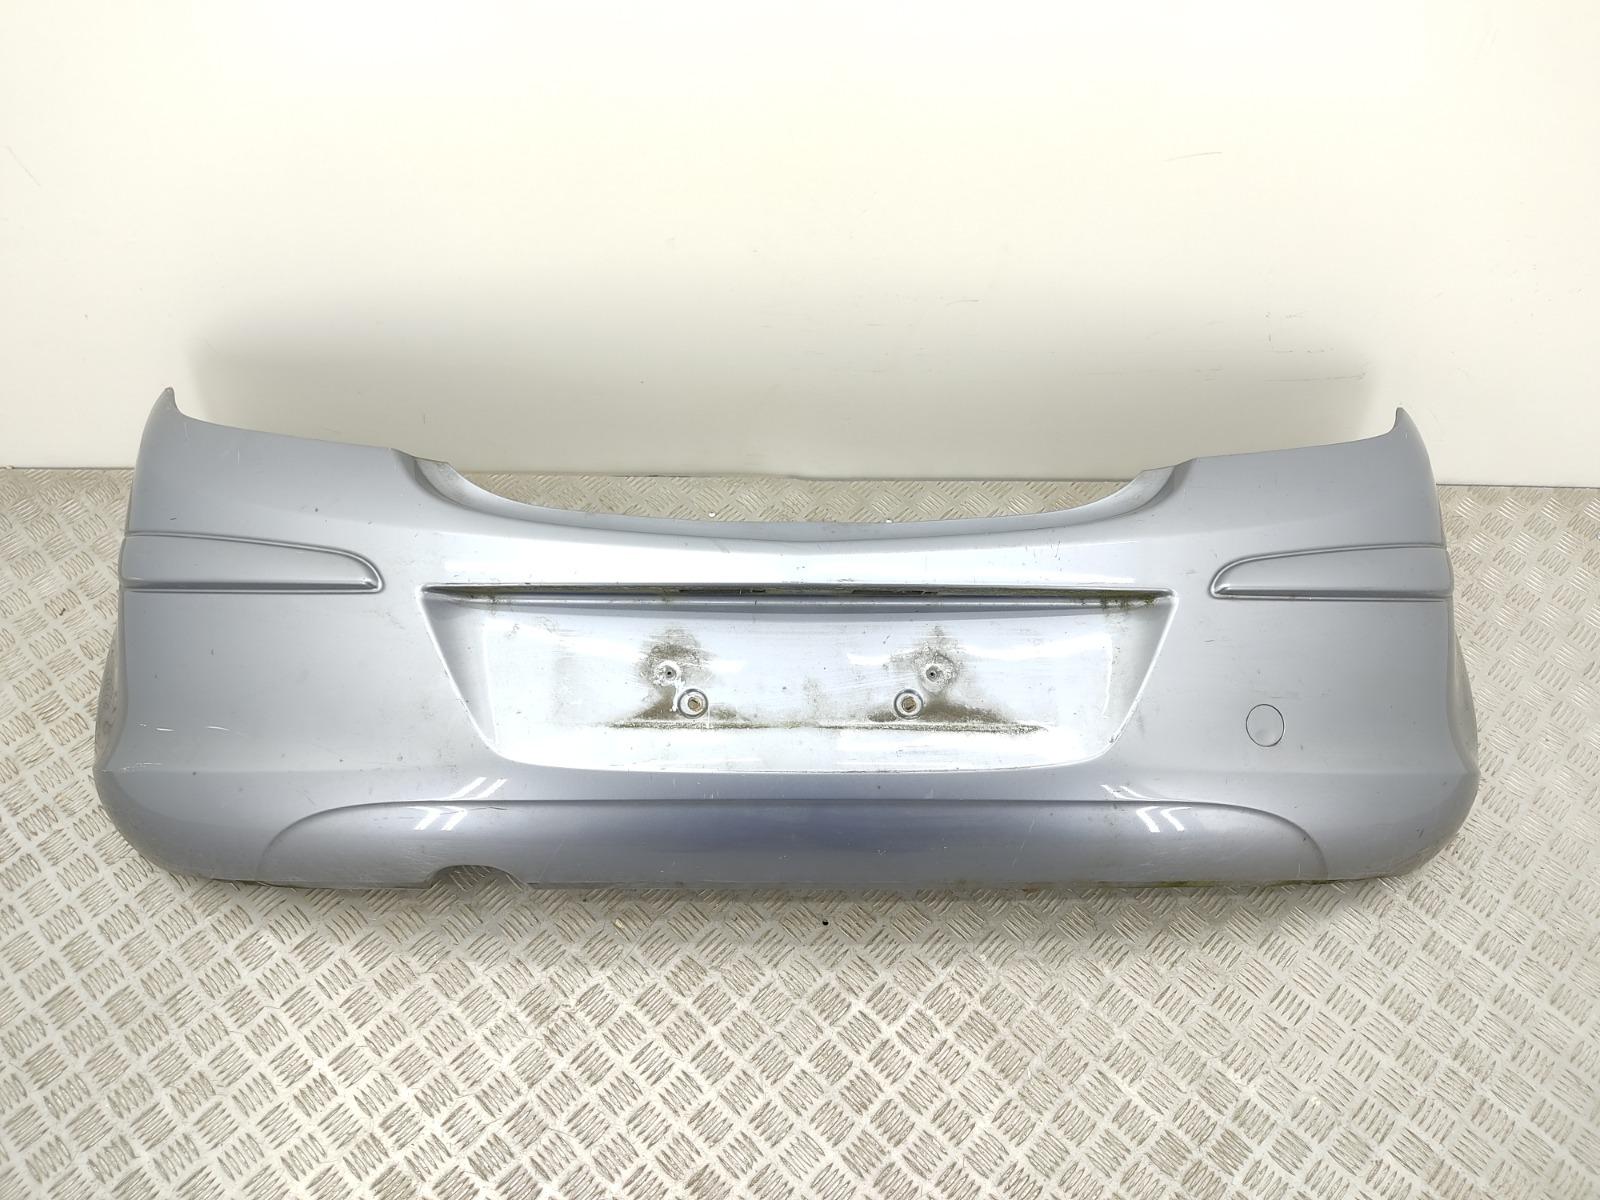 Бампер задний Opel Corsa D 1.2 I 2007 (б/у)